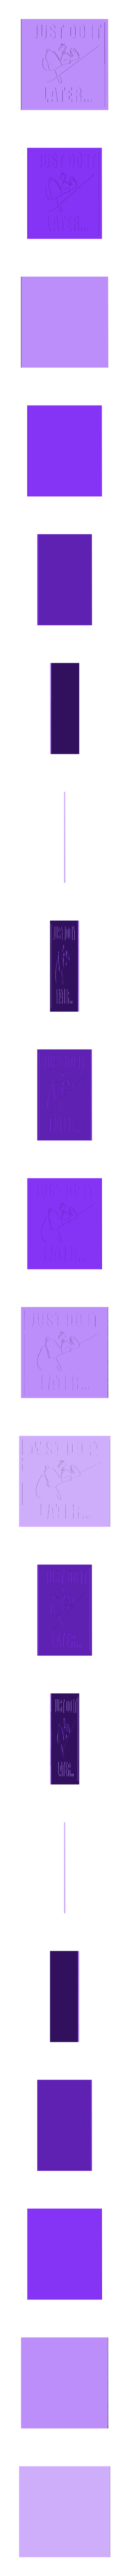 LOL_-_Snoopy_-_Nike_-_Just_Do_It_Later_v1.stl Télécharger fichier STL gratuit LOL - Snoopy - Nike - Just Do It Later • Plan à imprimer en 3D, yb__magiic